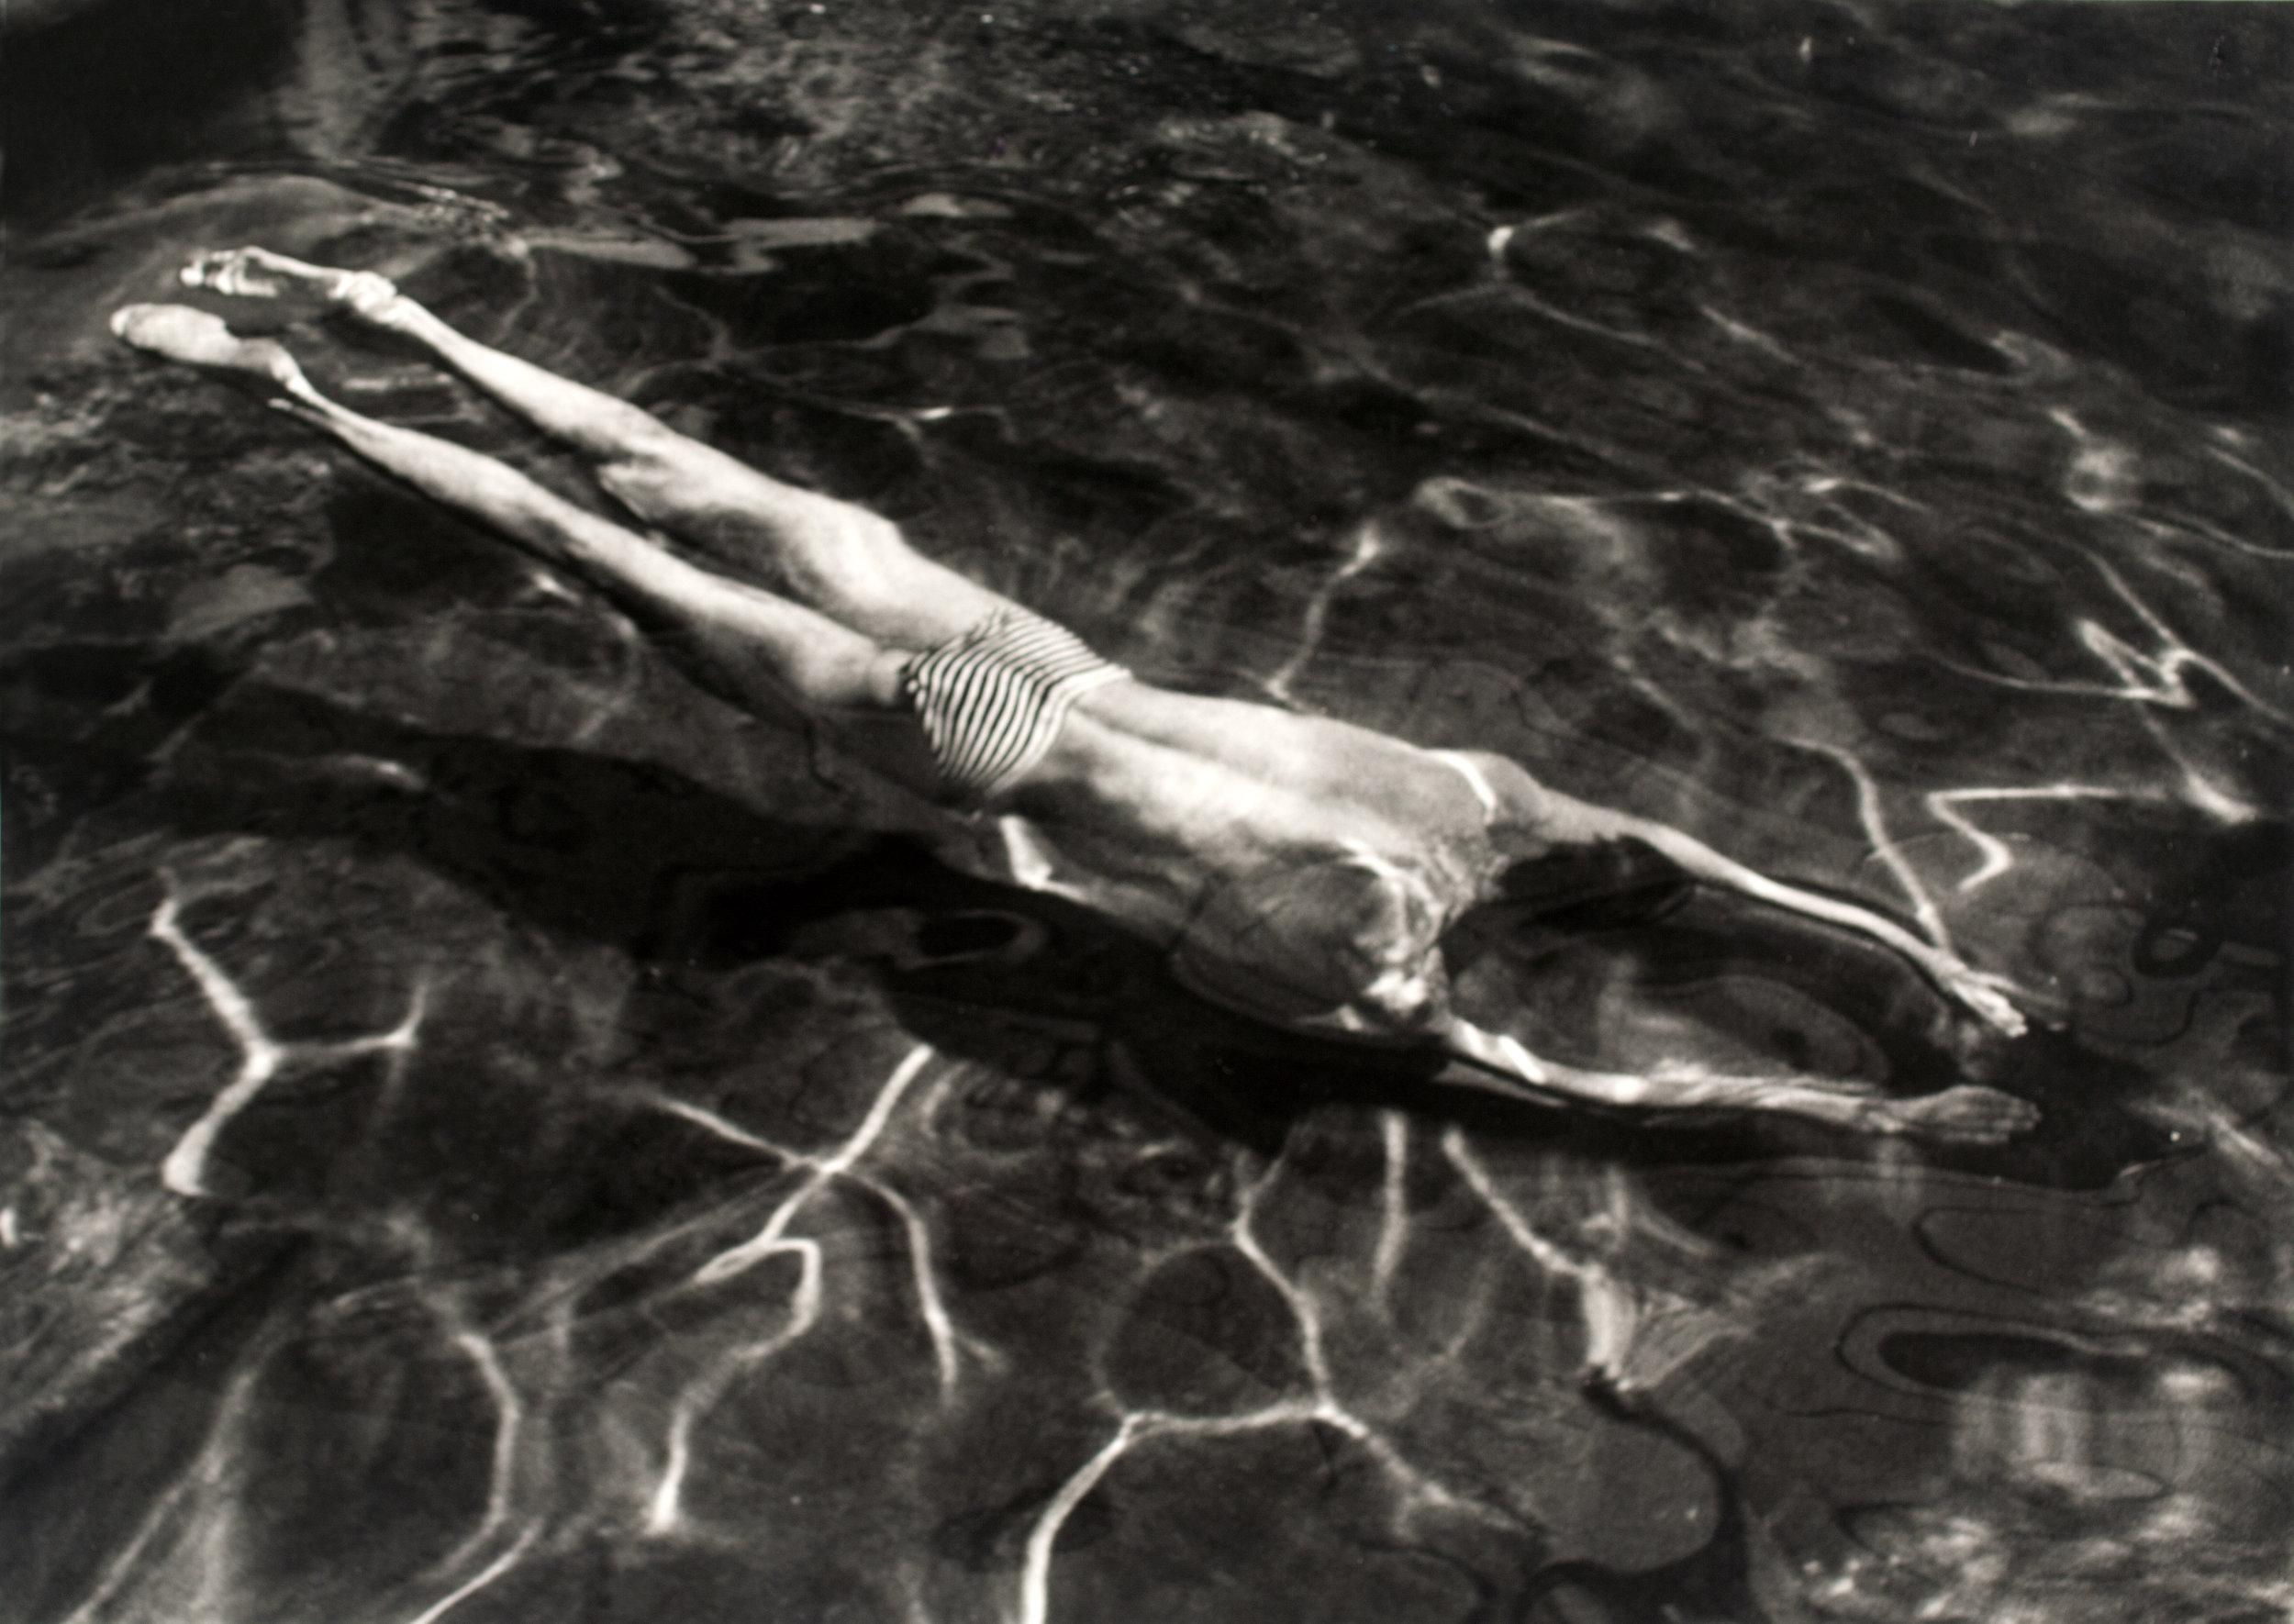 André Kertész 1894-1985, Underwater Swimmer, Esztergom, Hungary, 30 June ,1917,Photograph, gelatin silver print on paper,32 x 45 mm,The Sir Elton John Photography Collection,© Estate of André Kertész/Higher Pictures.